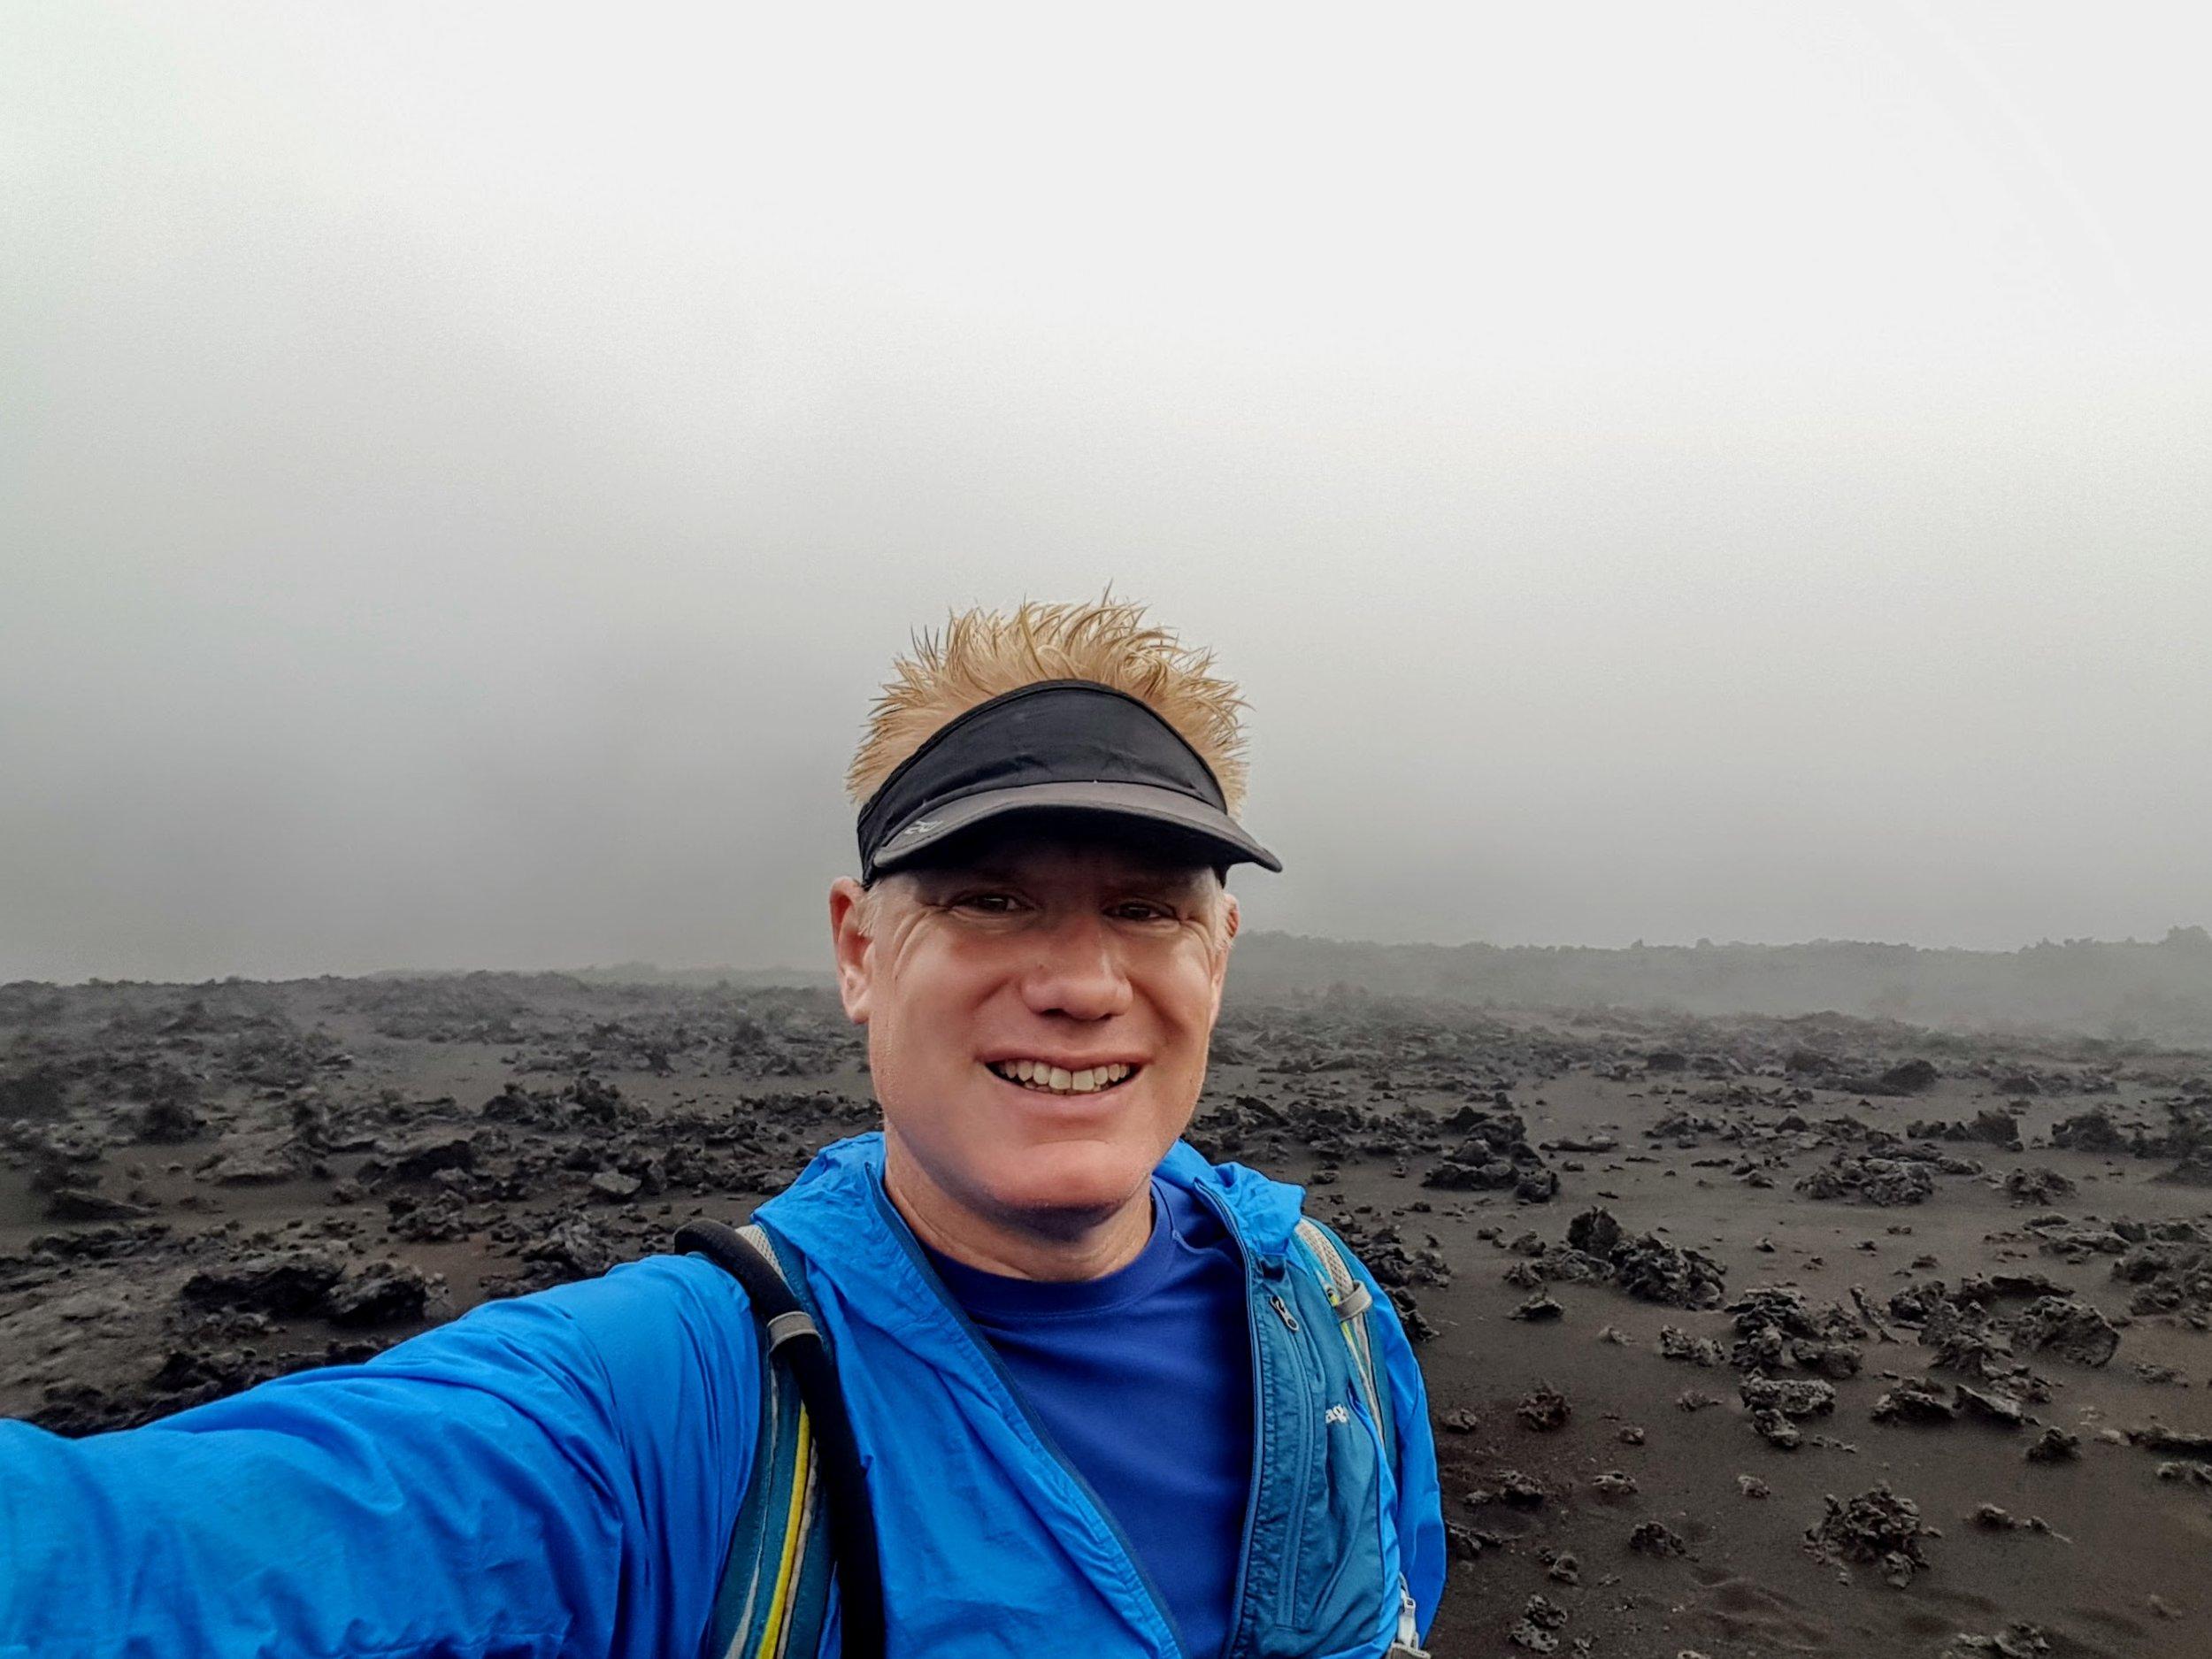 Christian hiking in Haleakala National Park in Maui.